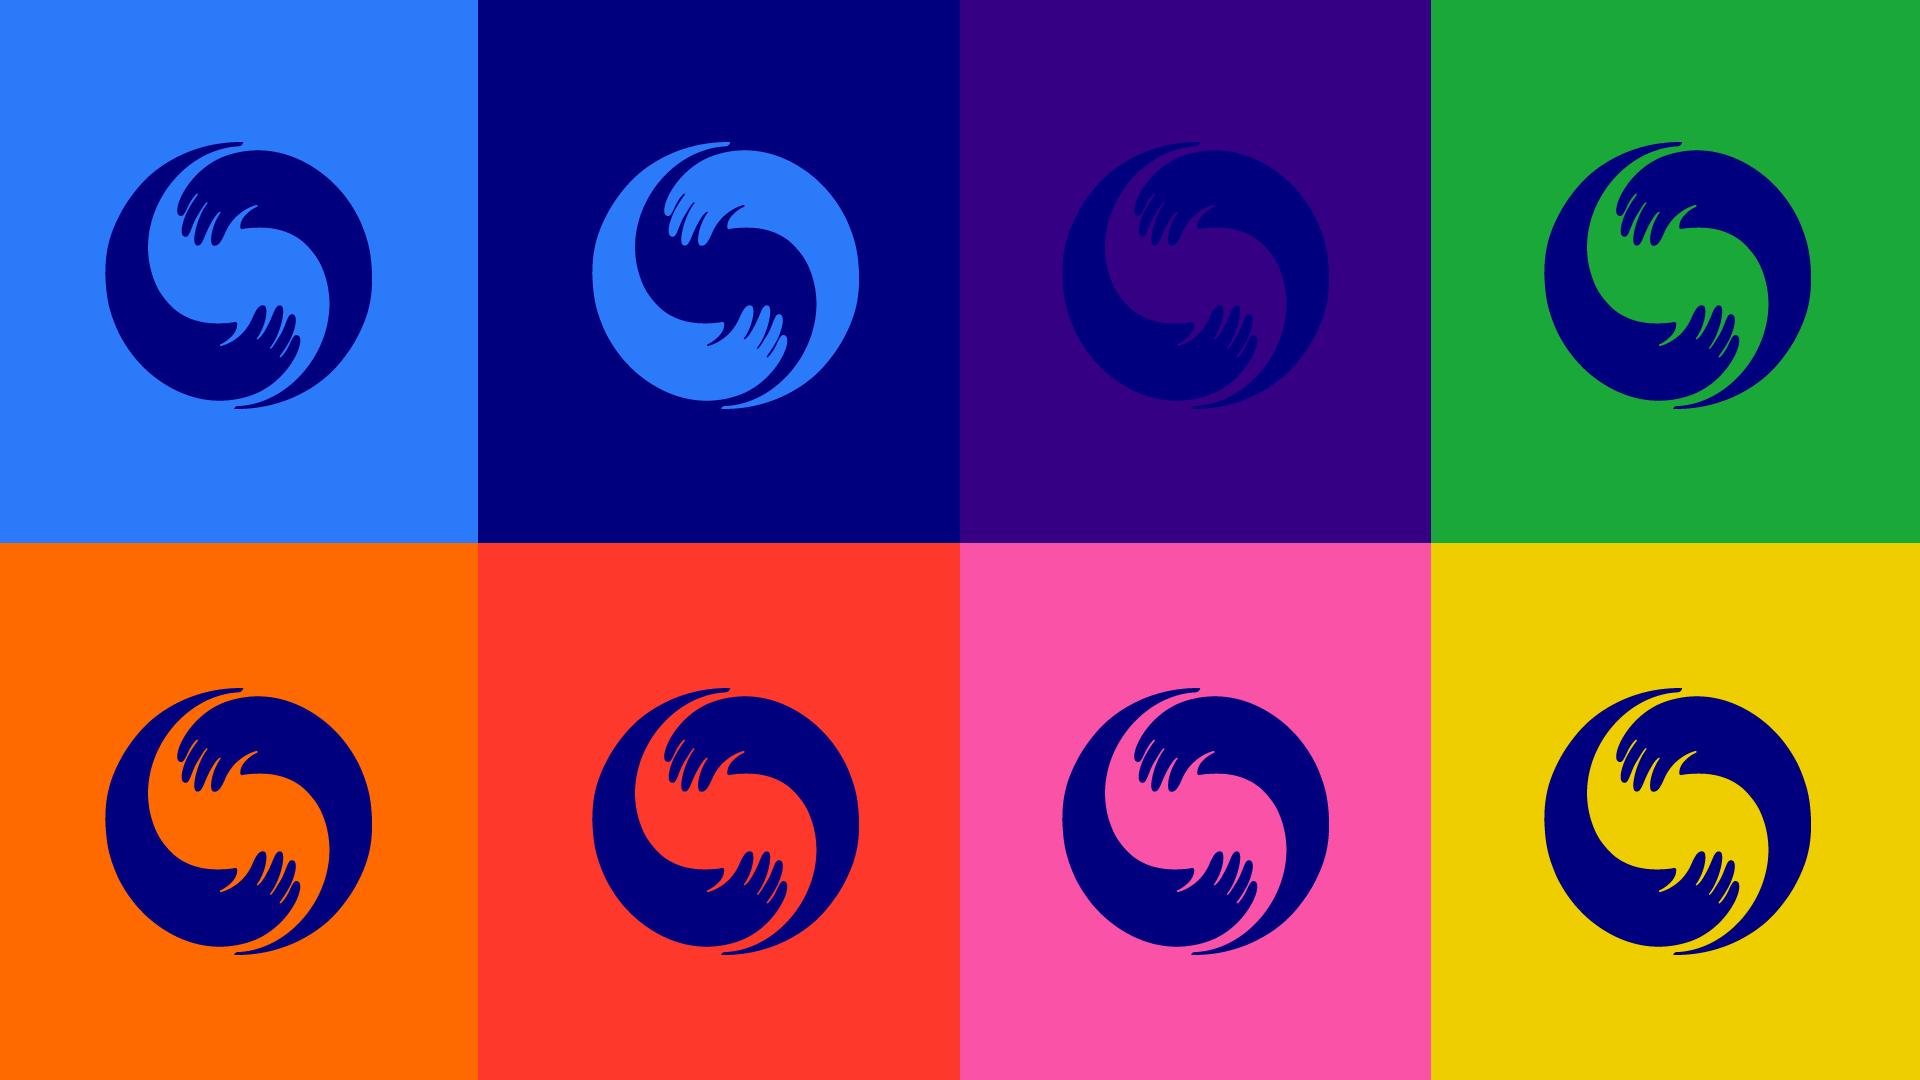 Tribox Design Creates Brand Identity of The Mystic Psychologist